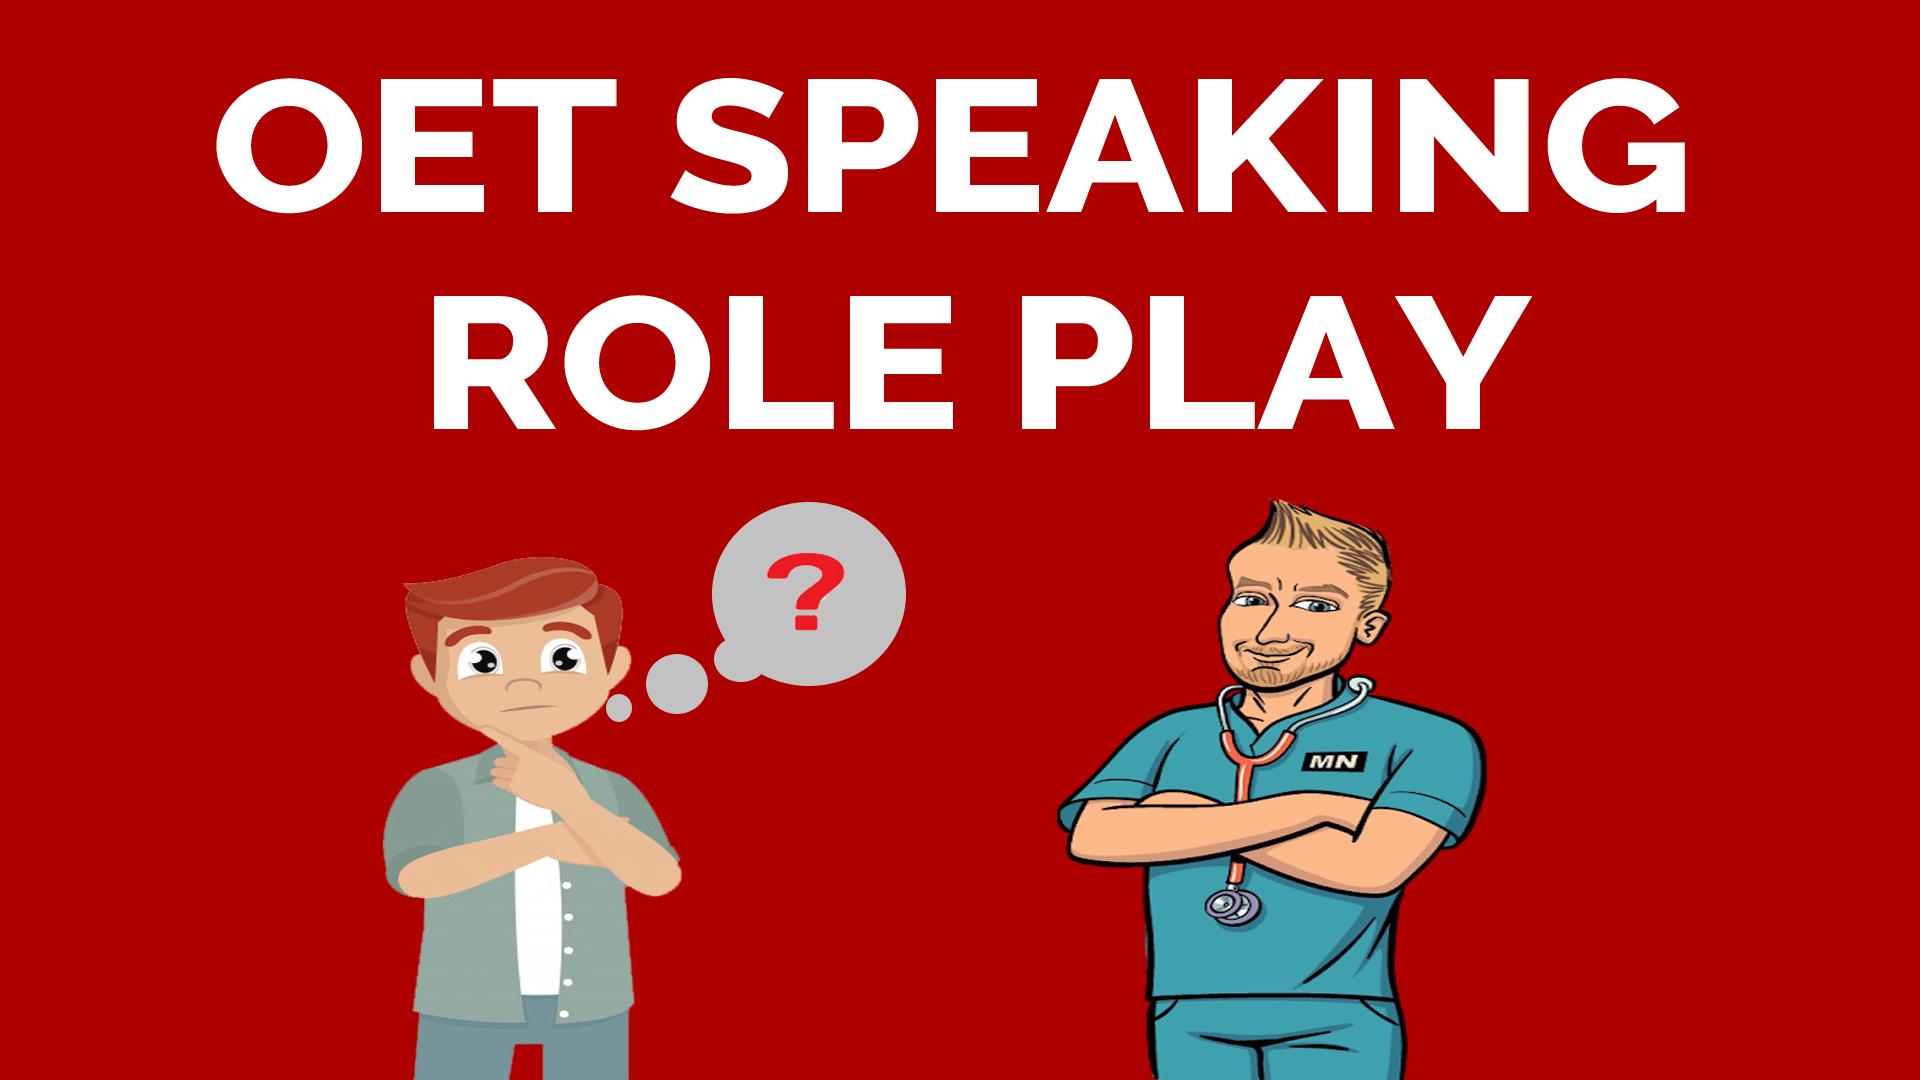 OET SAMPLE SPEAKING ROLE PLAY FOR NURSES - WORRIED PATIENT